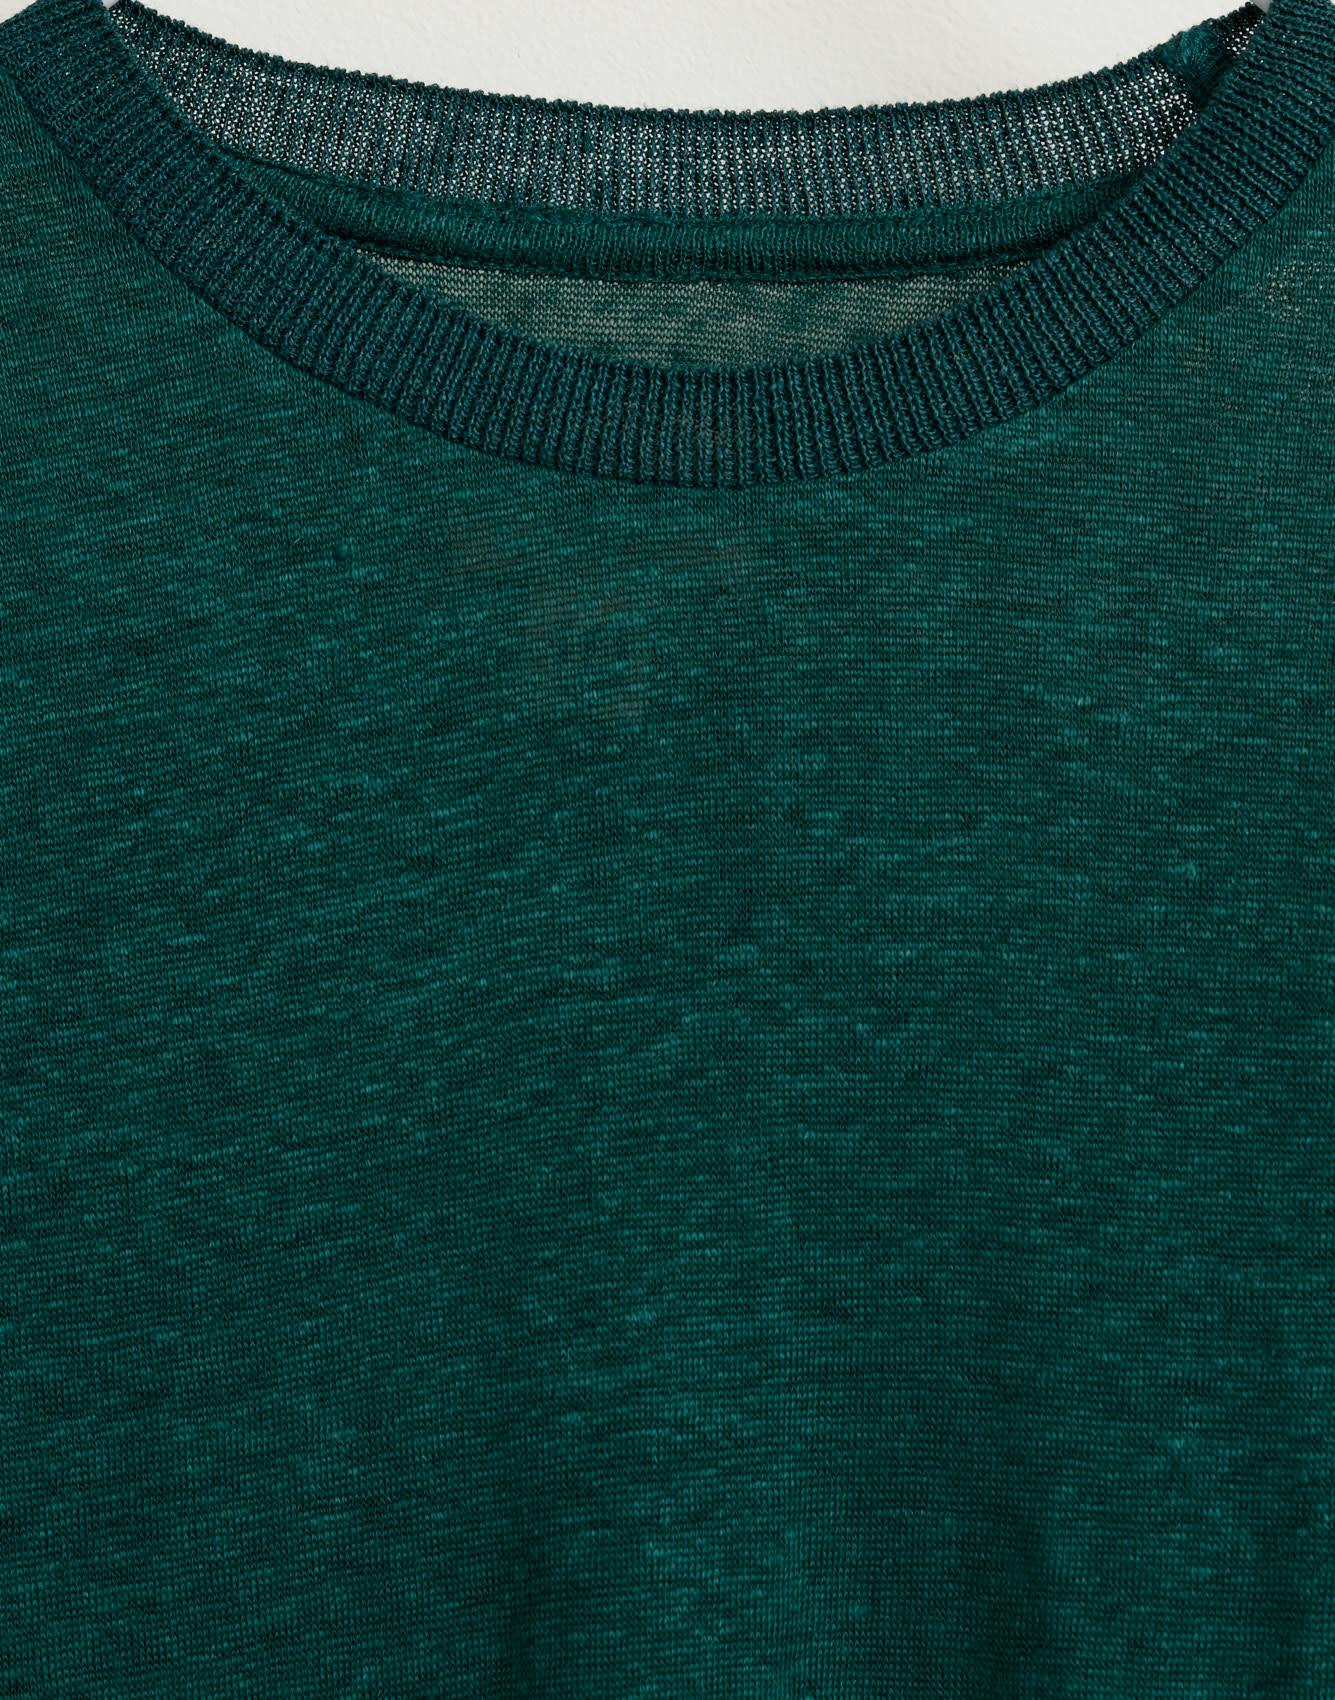 T-shirt pacific-4